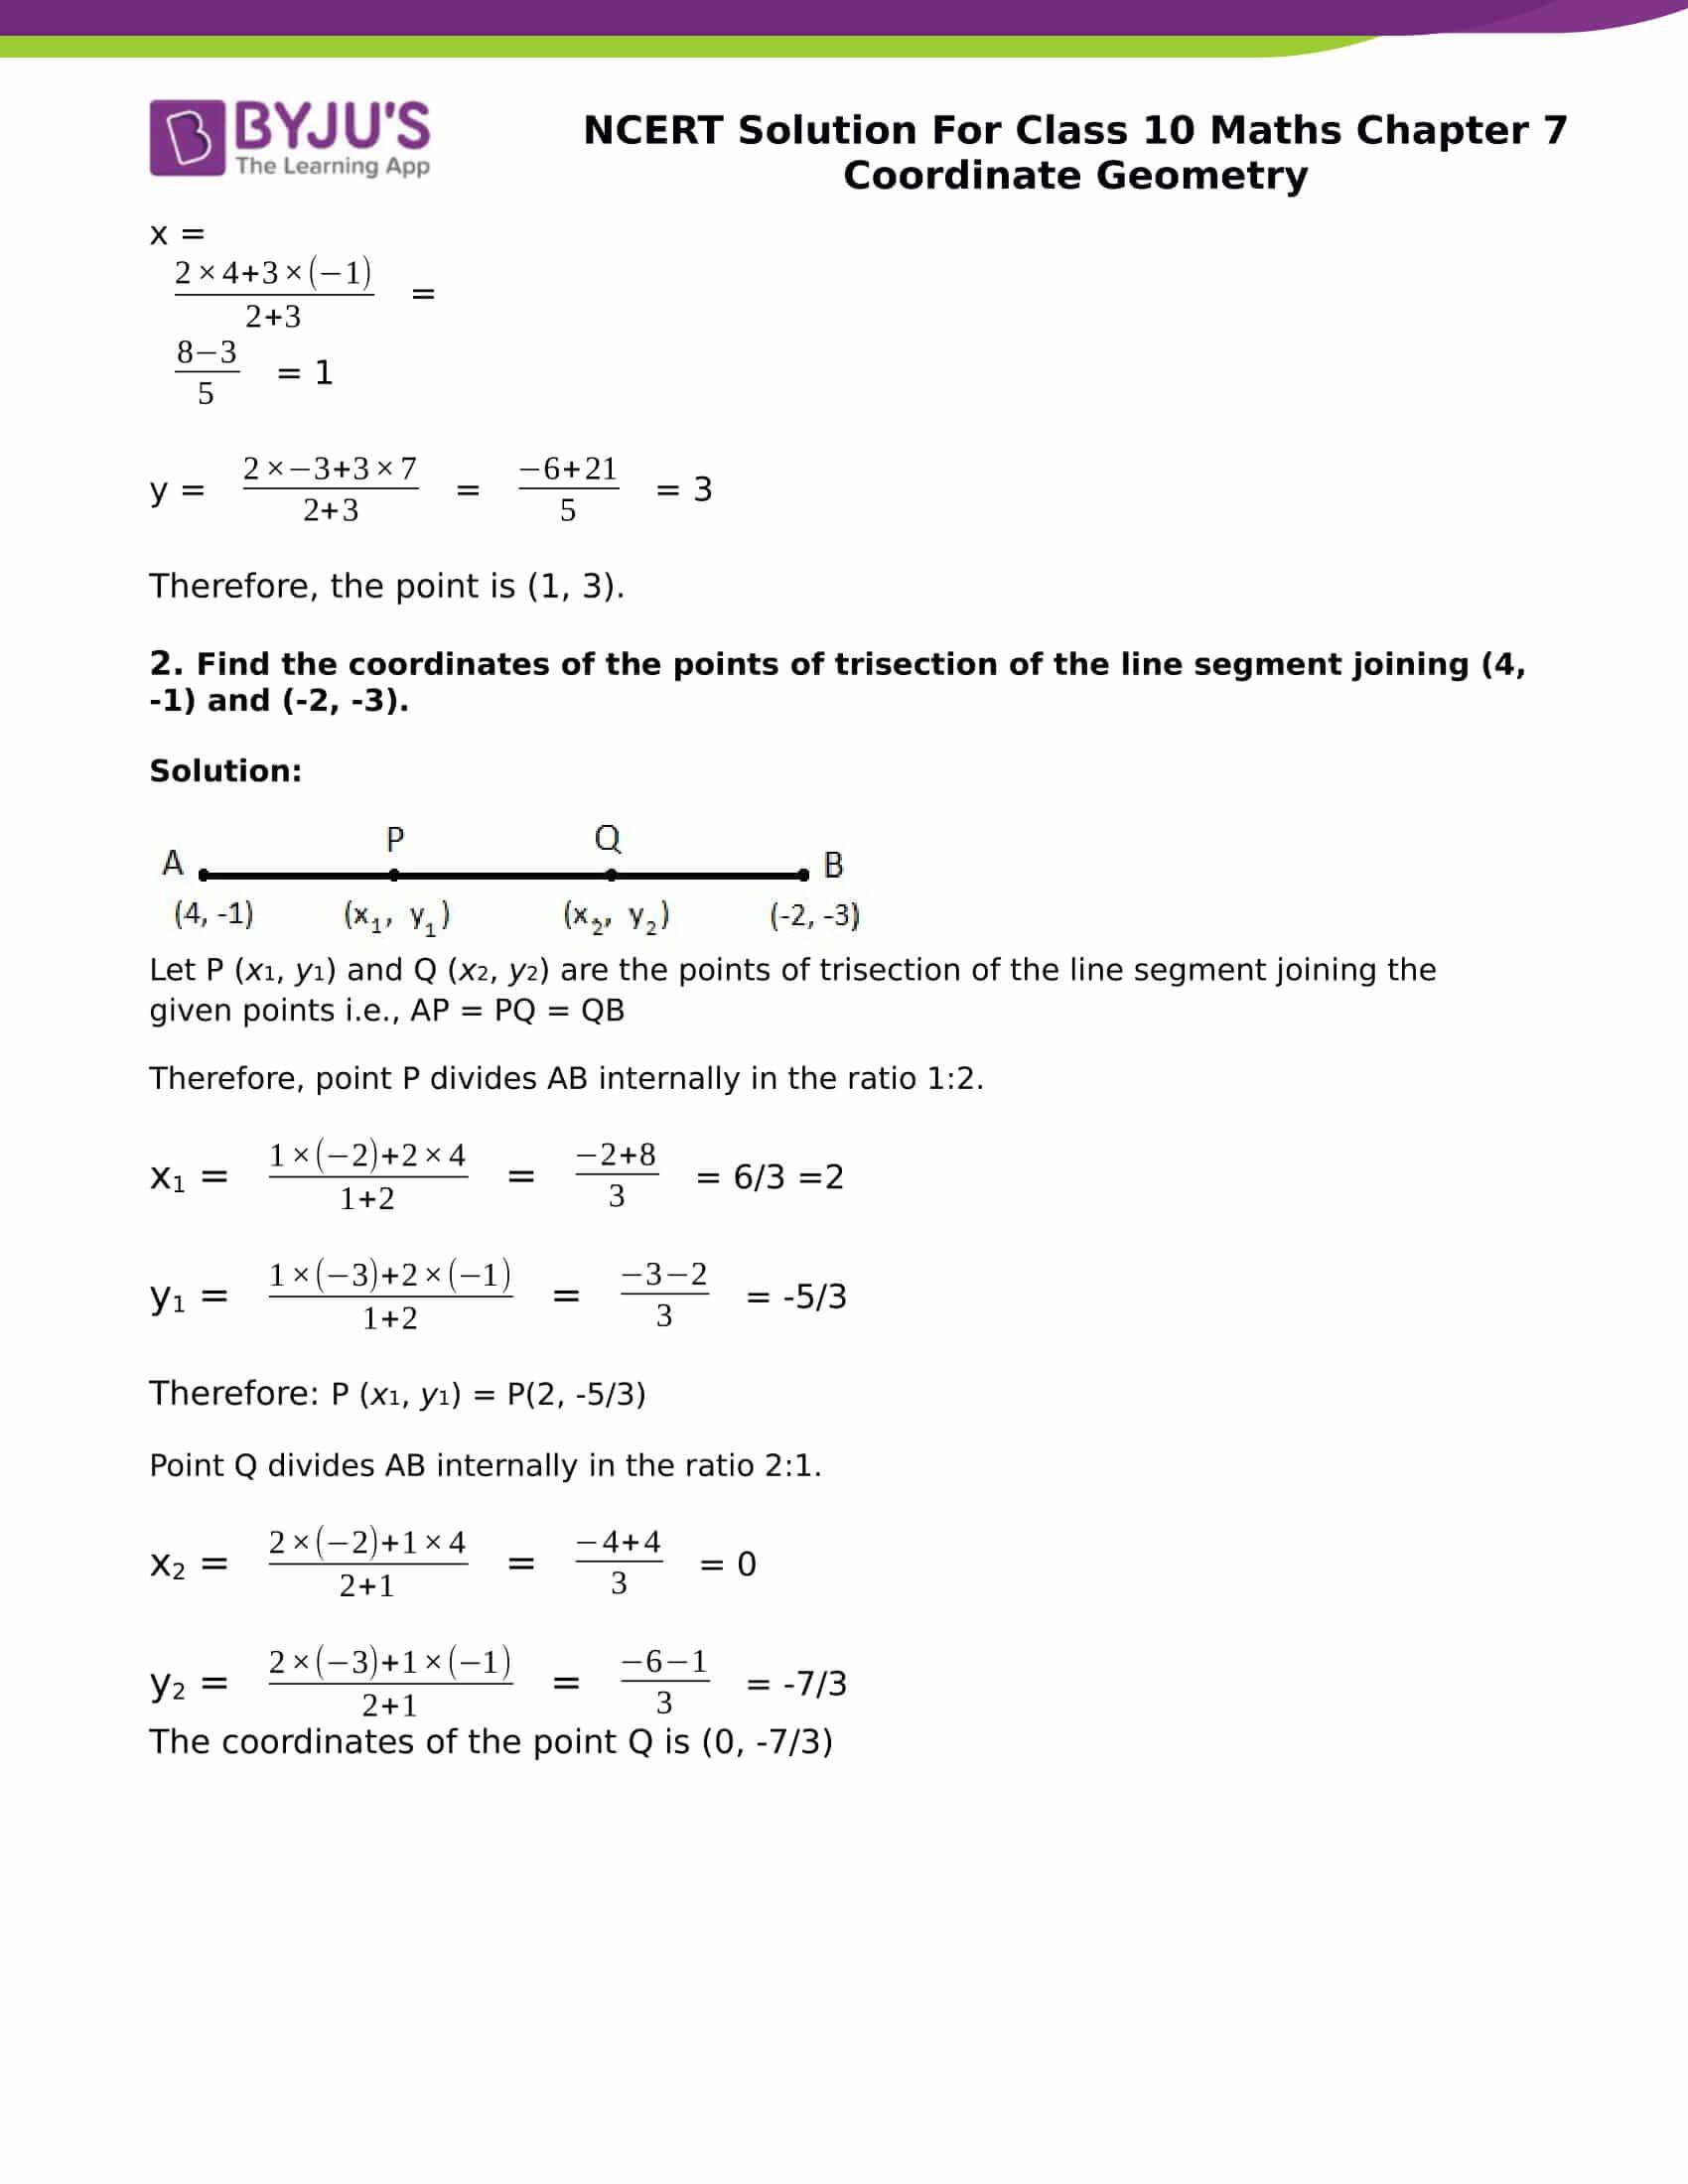 NCERT Solution for class 10 Maths chapter 7 Coordinate Geometry Part 11